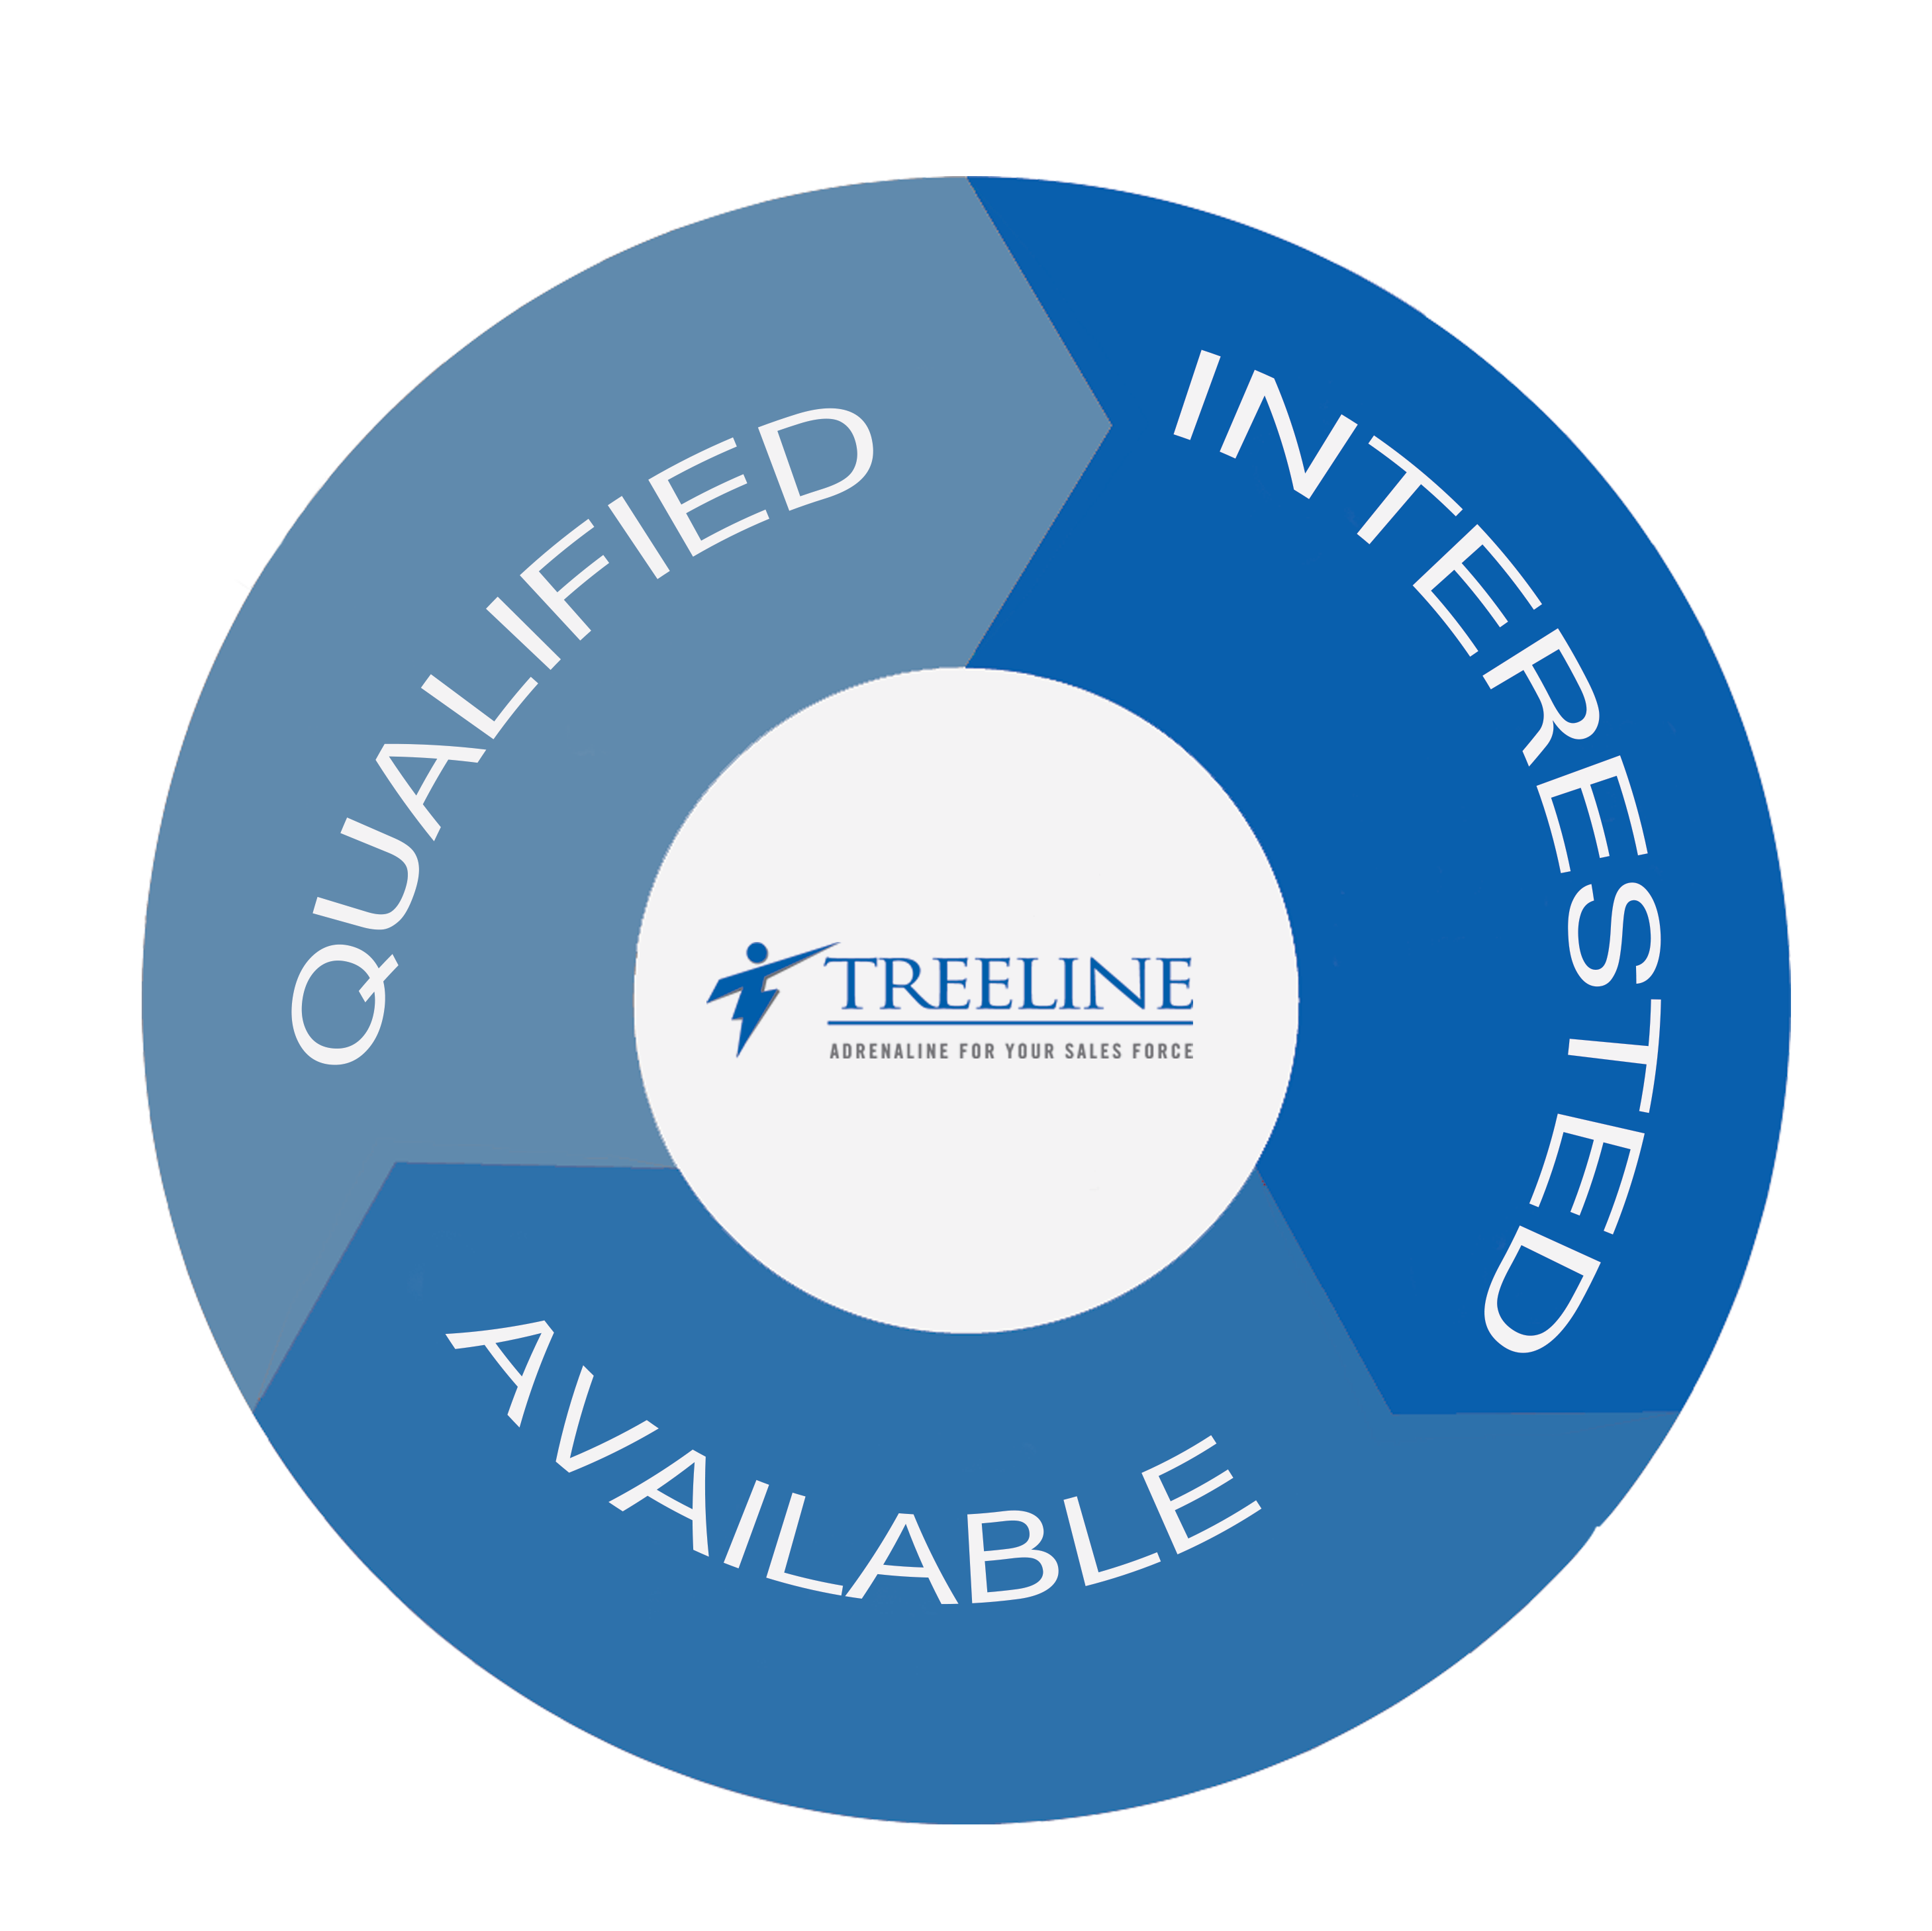 Treeline Brand Promise